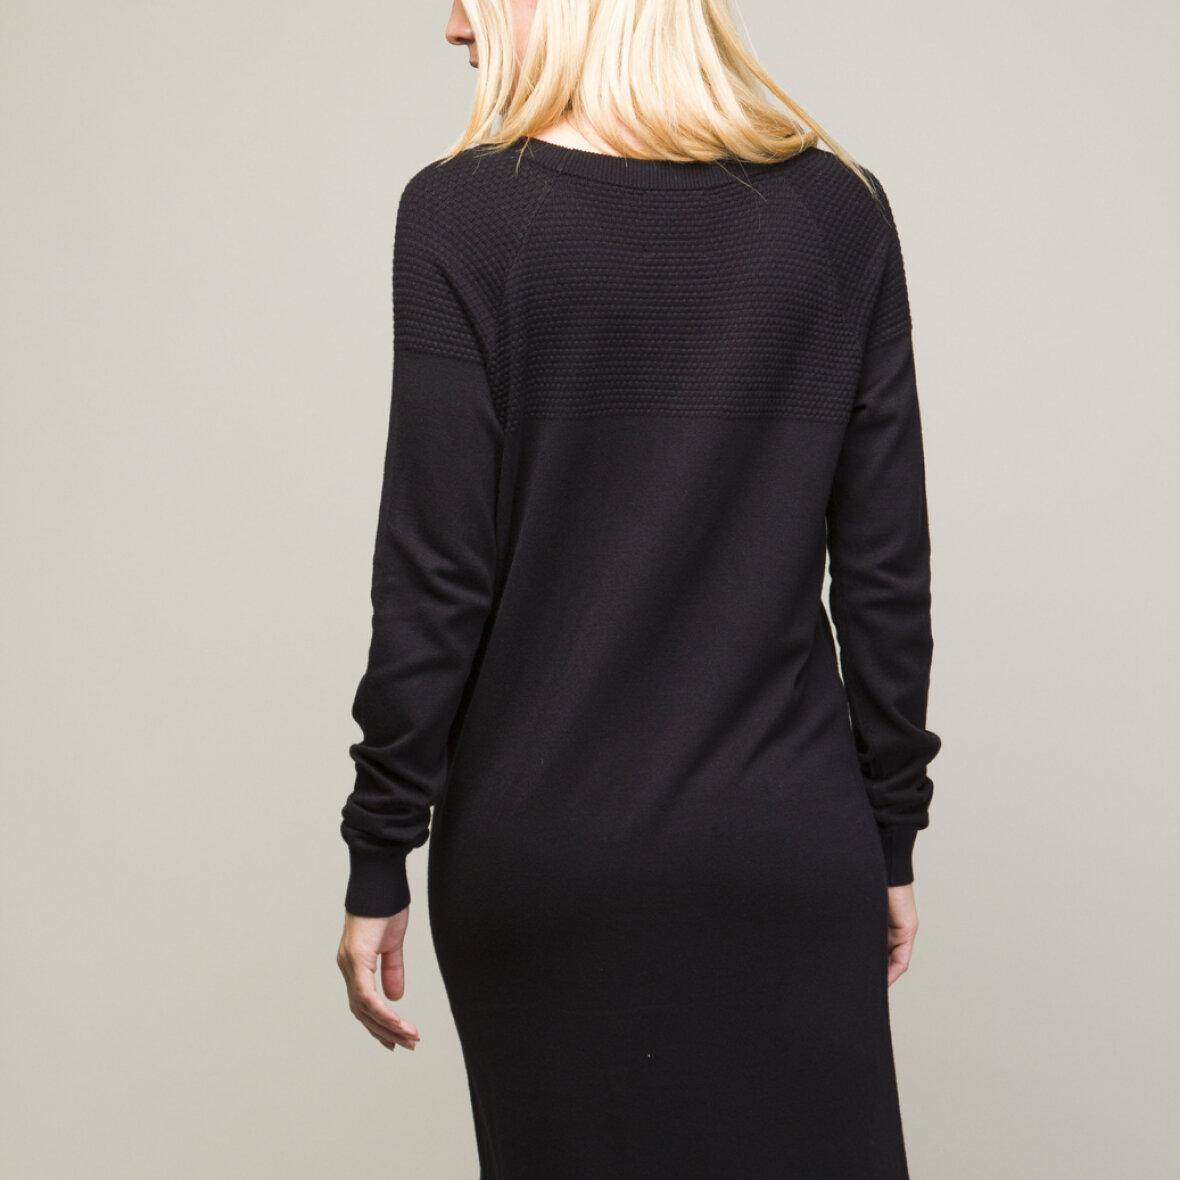 Inwear Online Tøj Køb Levering Hurtig S1Twwq